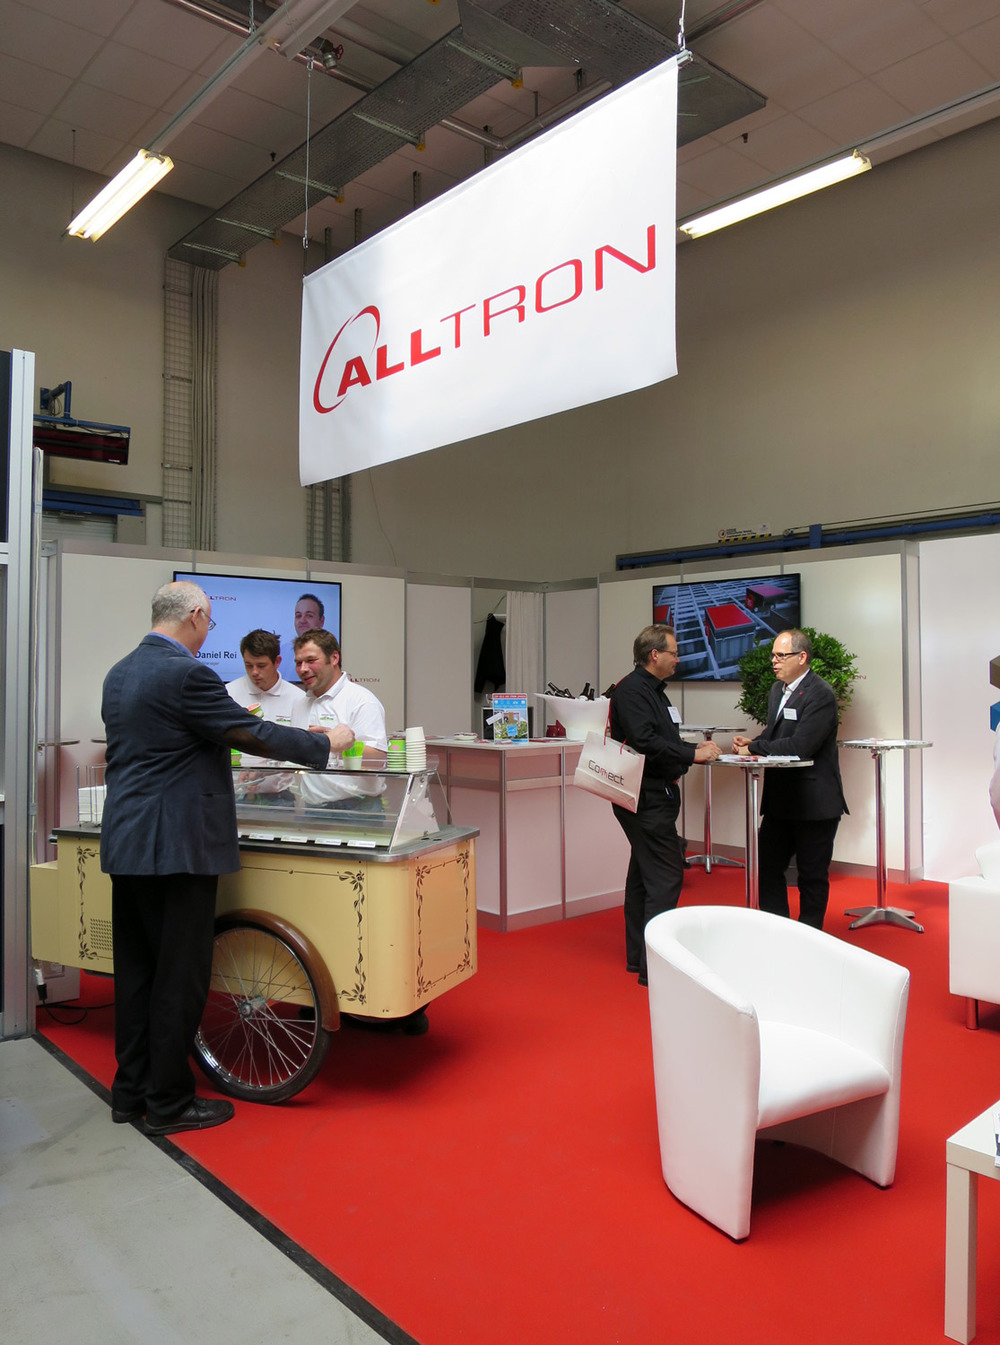 PENGland-AG_Erlebnisbericht_Competec-Hausmesse_Brack-&-Alltron-(30)_web.jpg